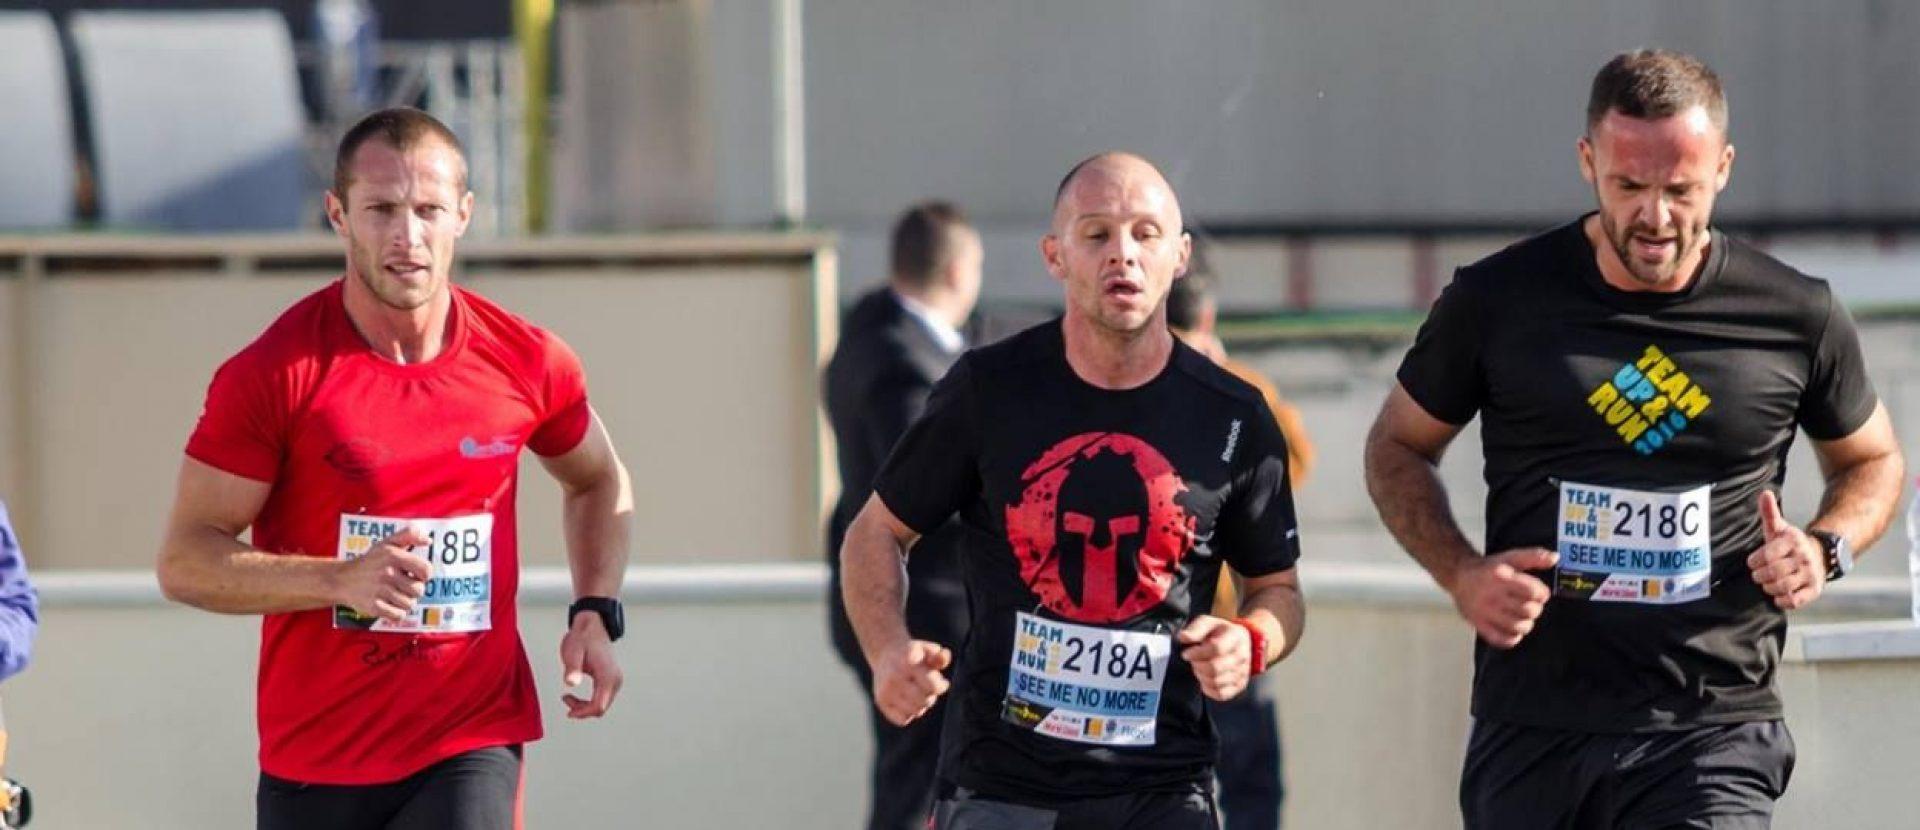 Team Up & Run!